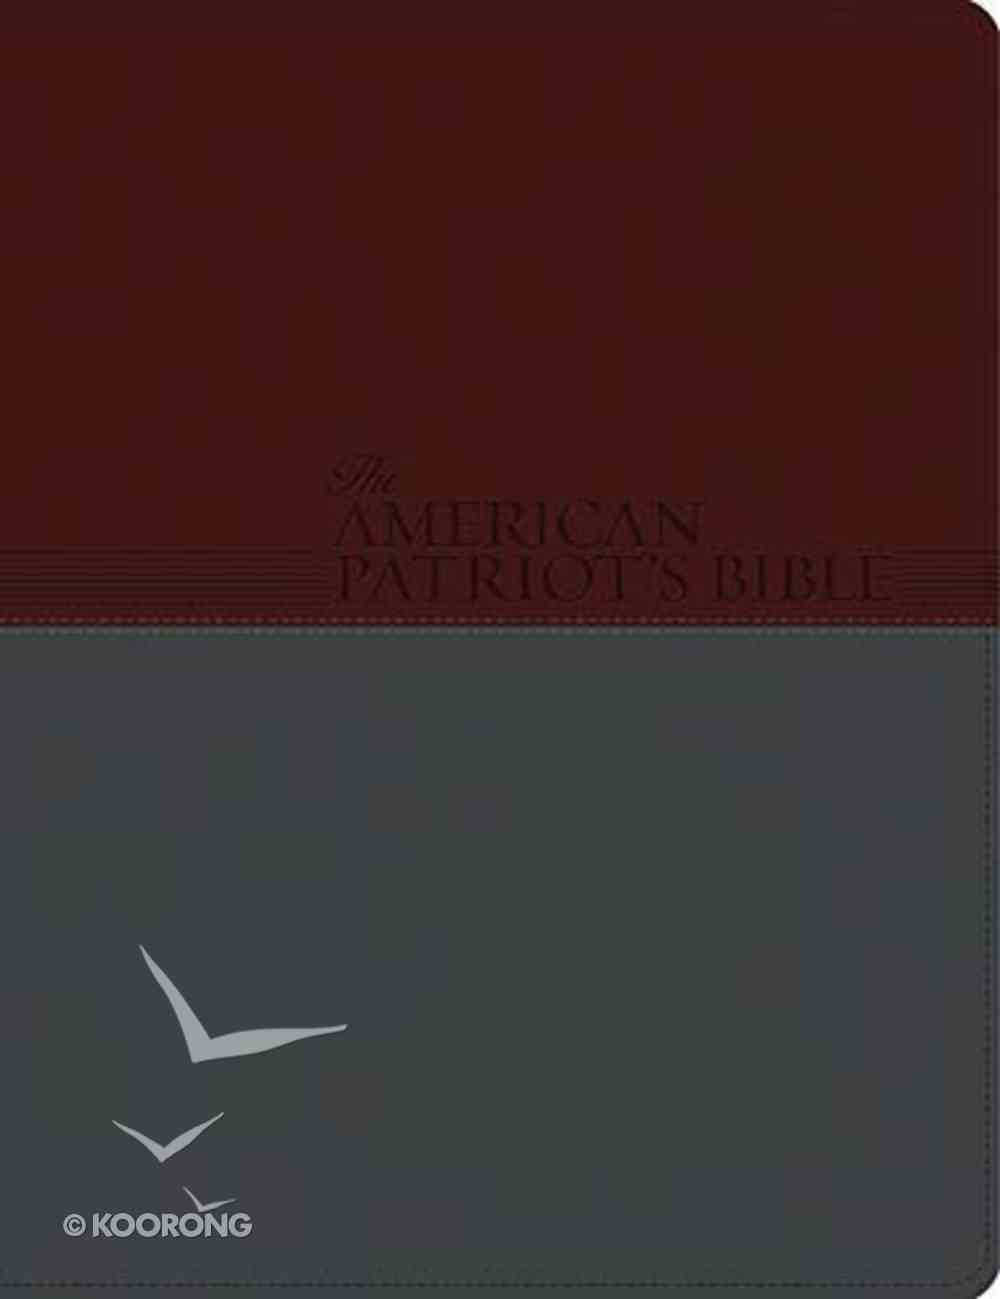 KJV American Patriot's Bible Chestnut Imitation Leather